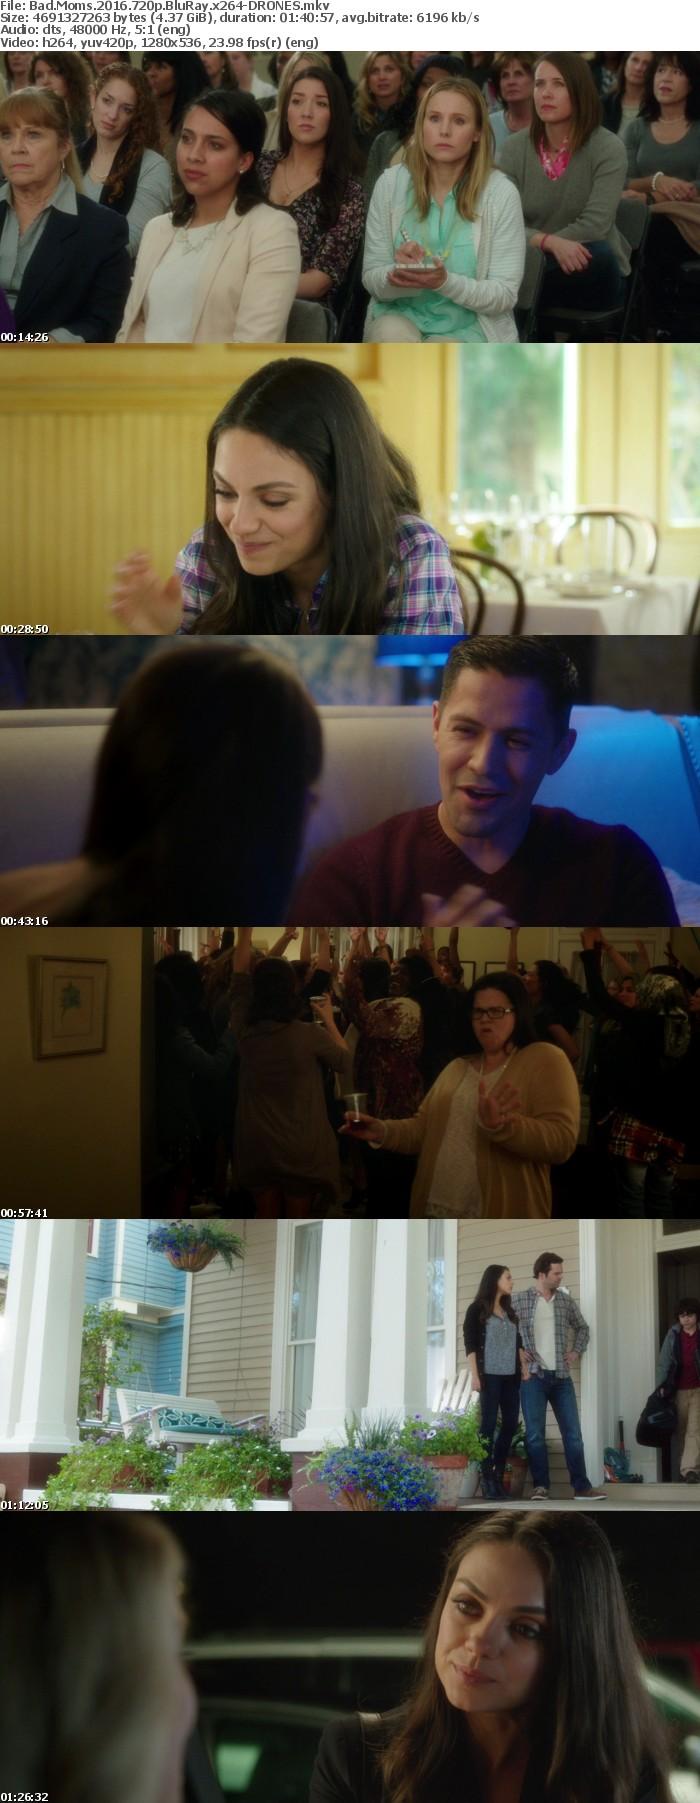 Bad Moms 2016 720p BluRay x264-DRONES